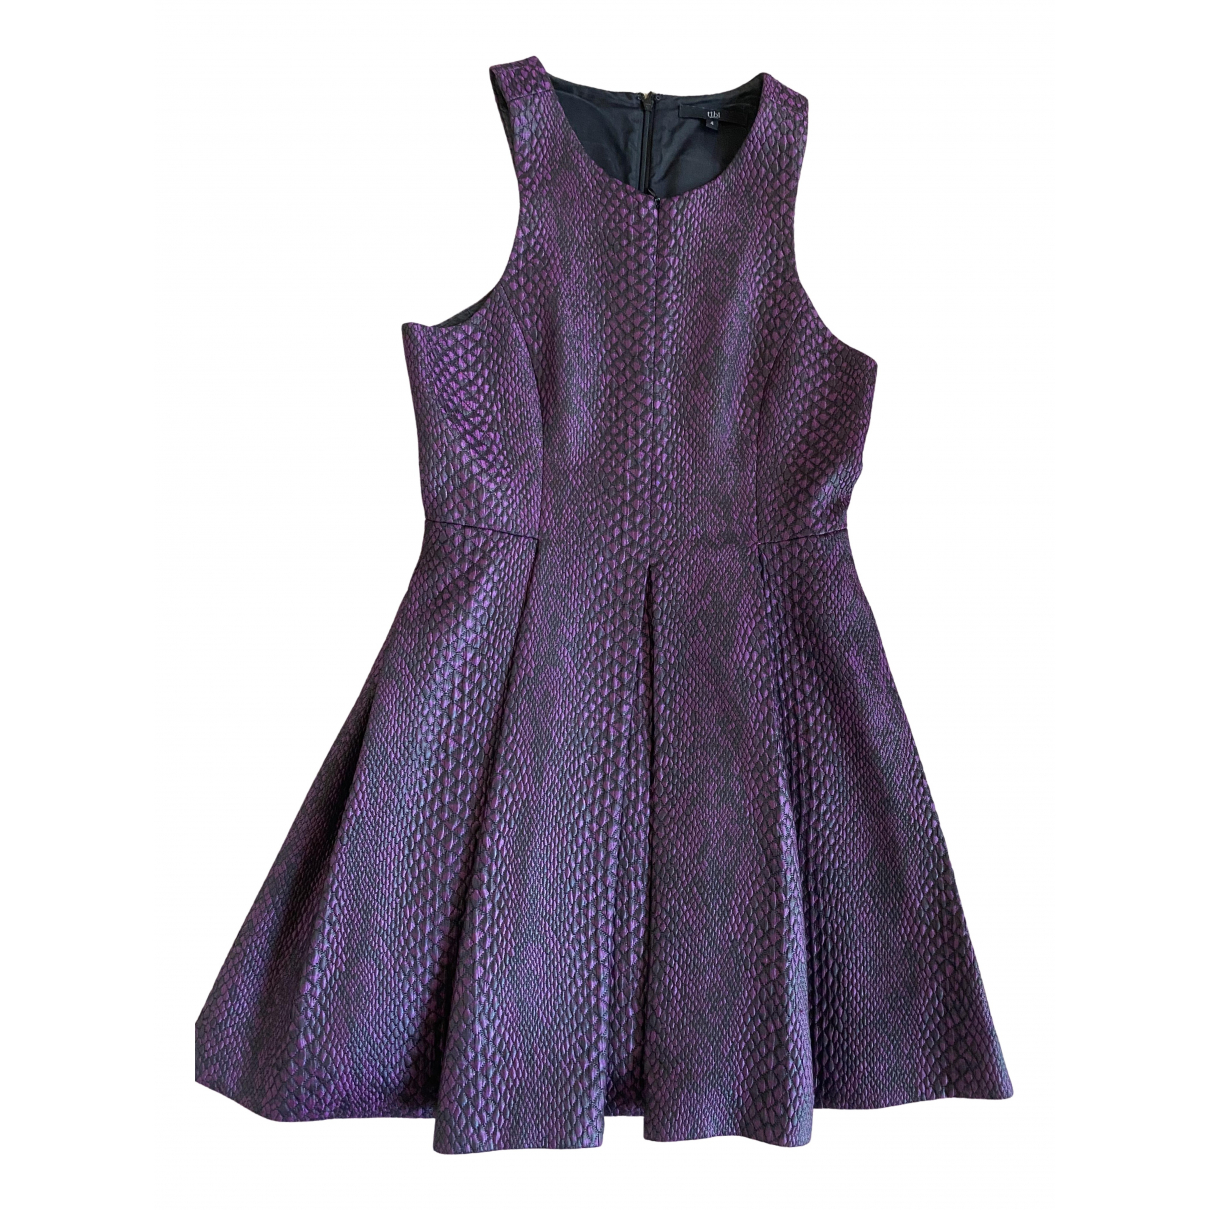 Tibi \N Kleid in  Lila Polyester